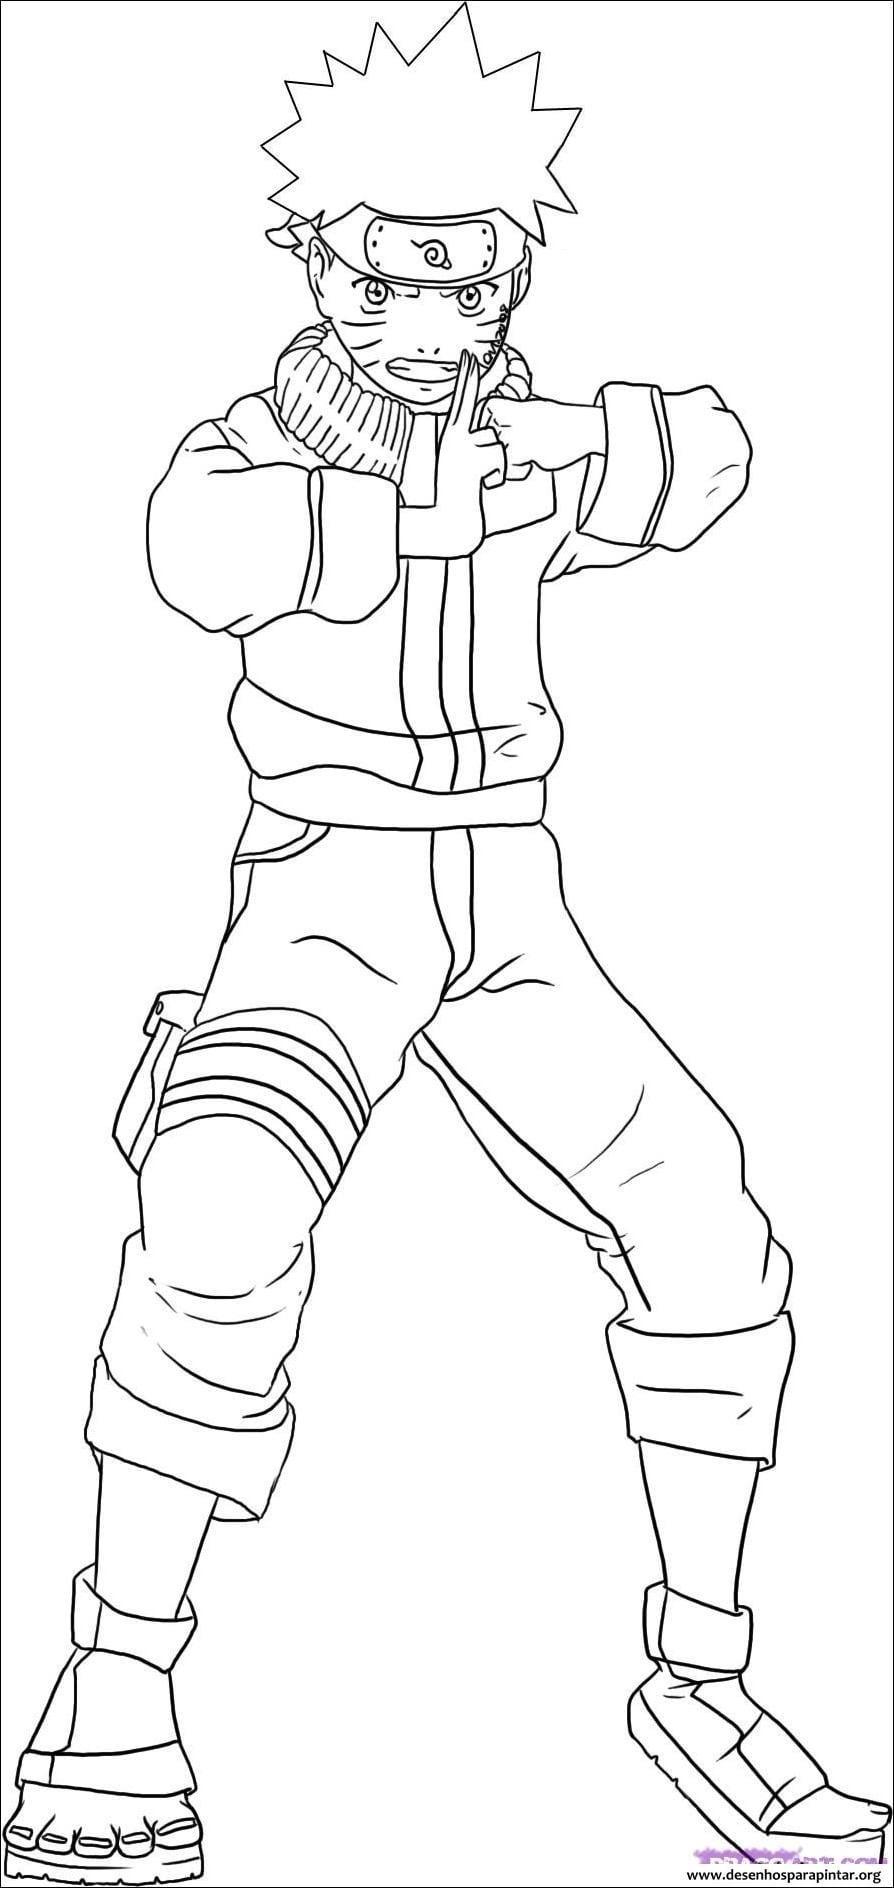 Naruto_desenhos_colorir_pintar_imprimir